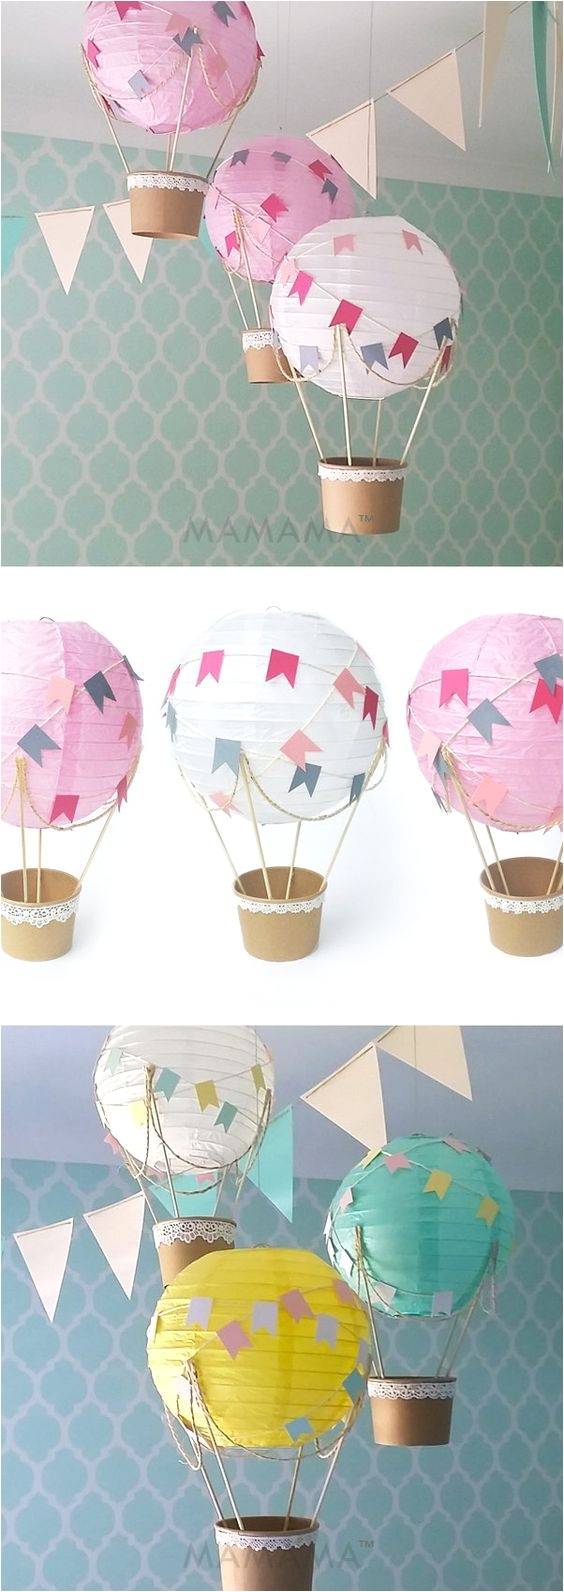 Cheap Baby Shower Decoration Kits Whimsical Hot Air Balloon